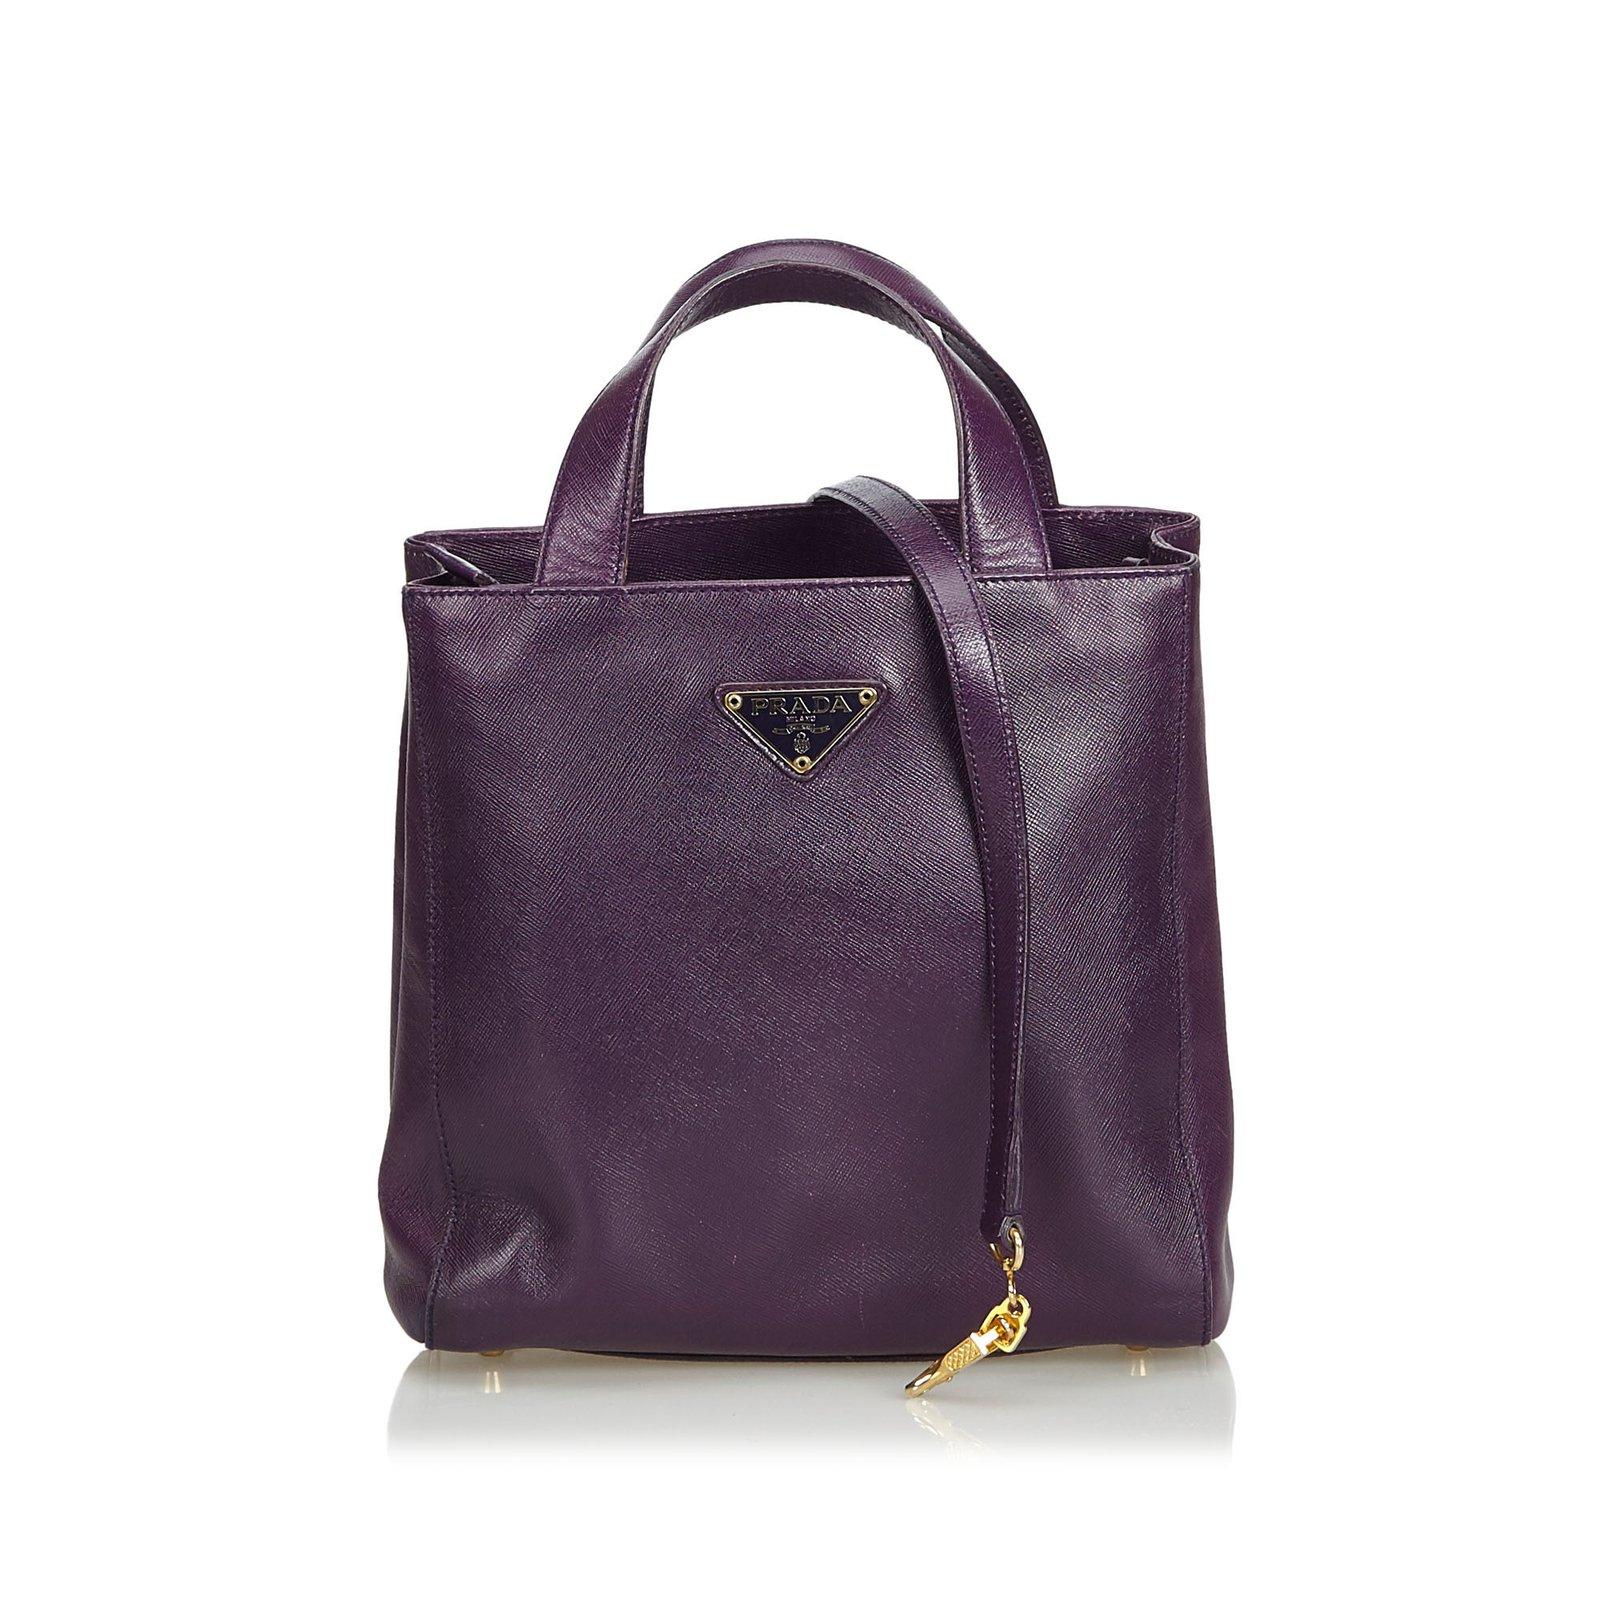 201df3ef9f Prada Saffiano Leather Lux Satchel Handbags Leather,Other Purple ref.103271